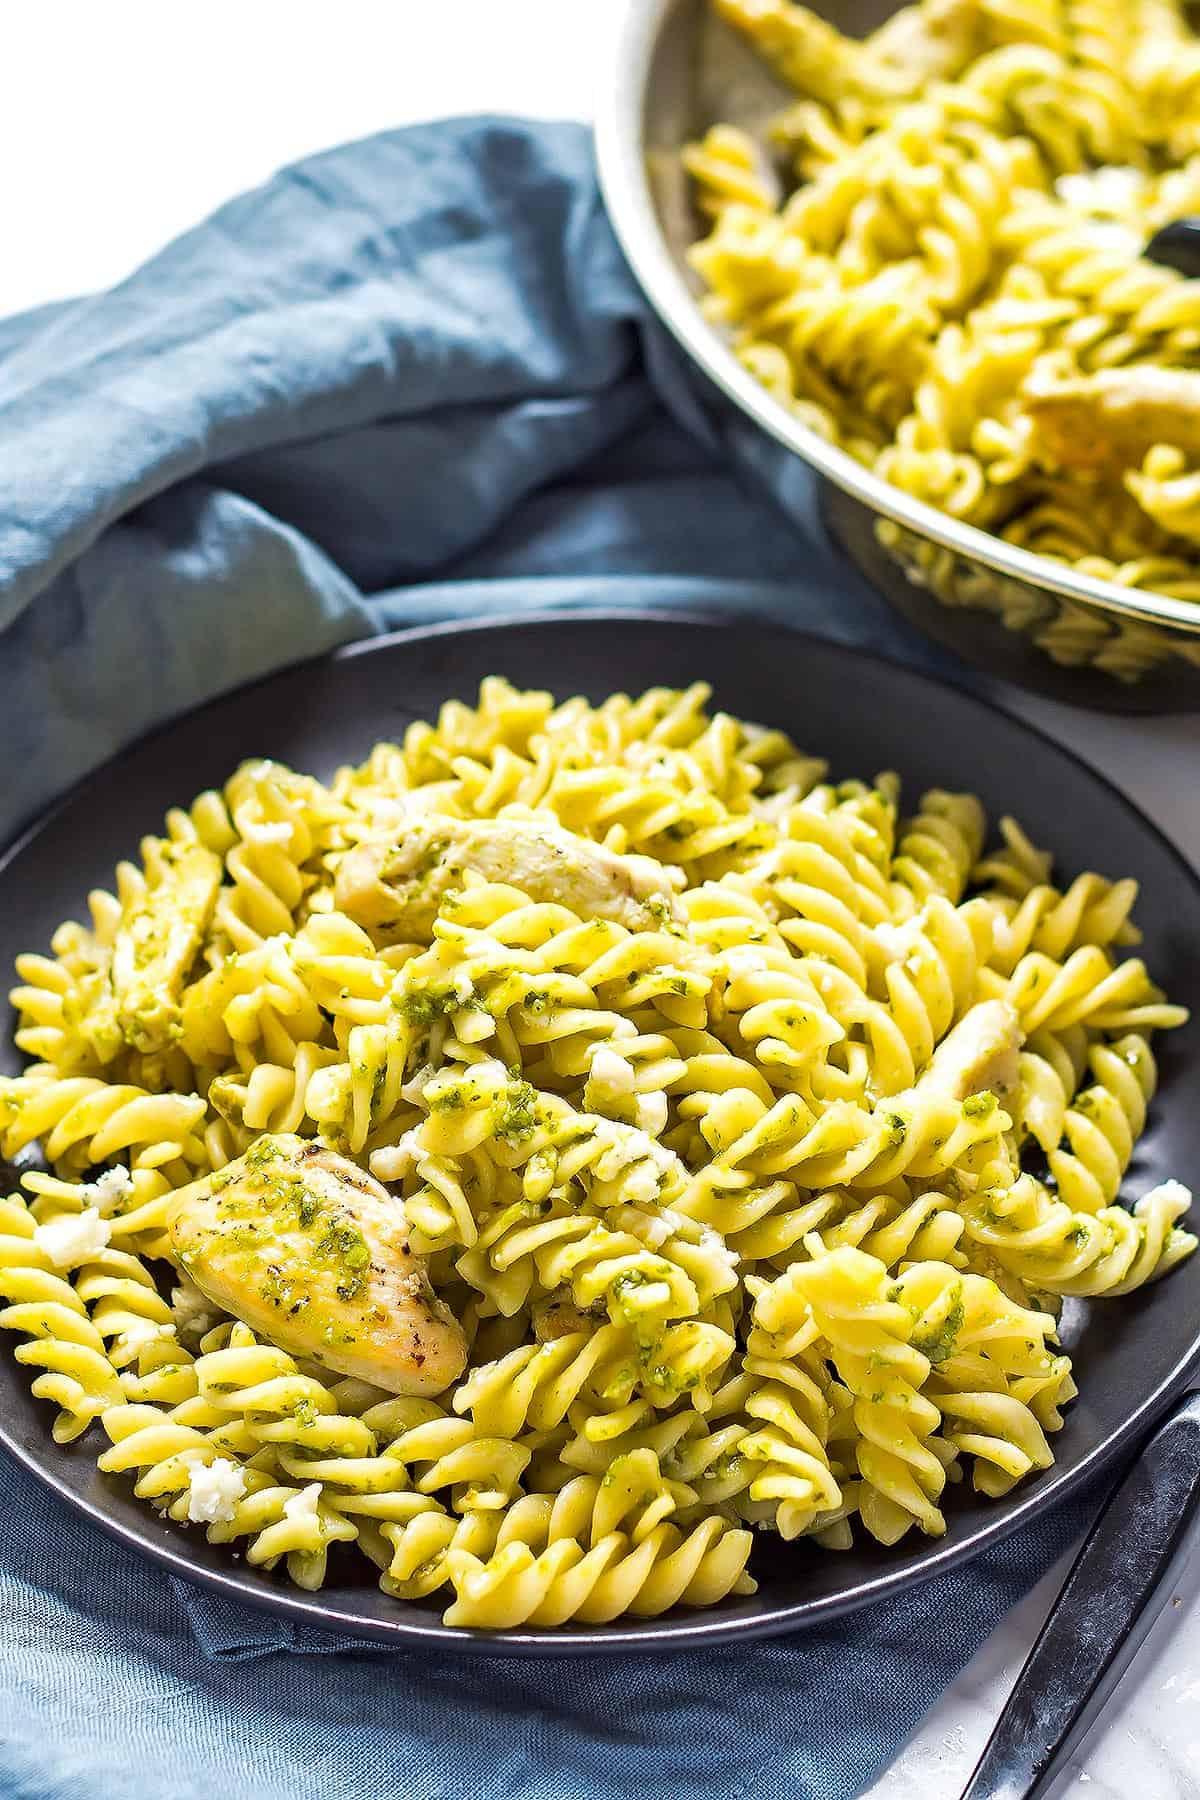 Pesto Chicken Pasta on plate